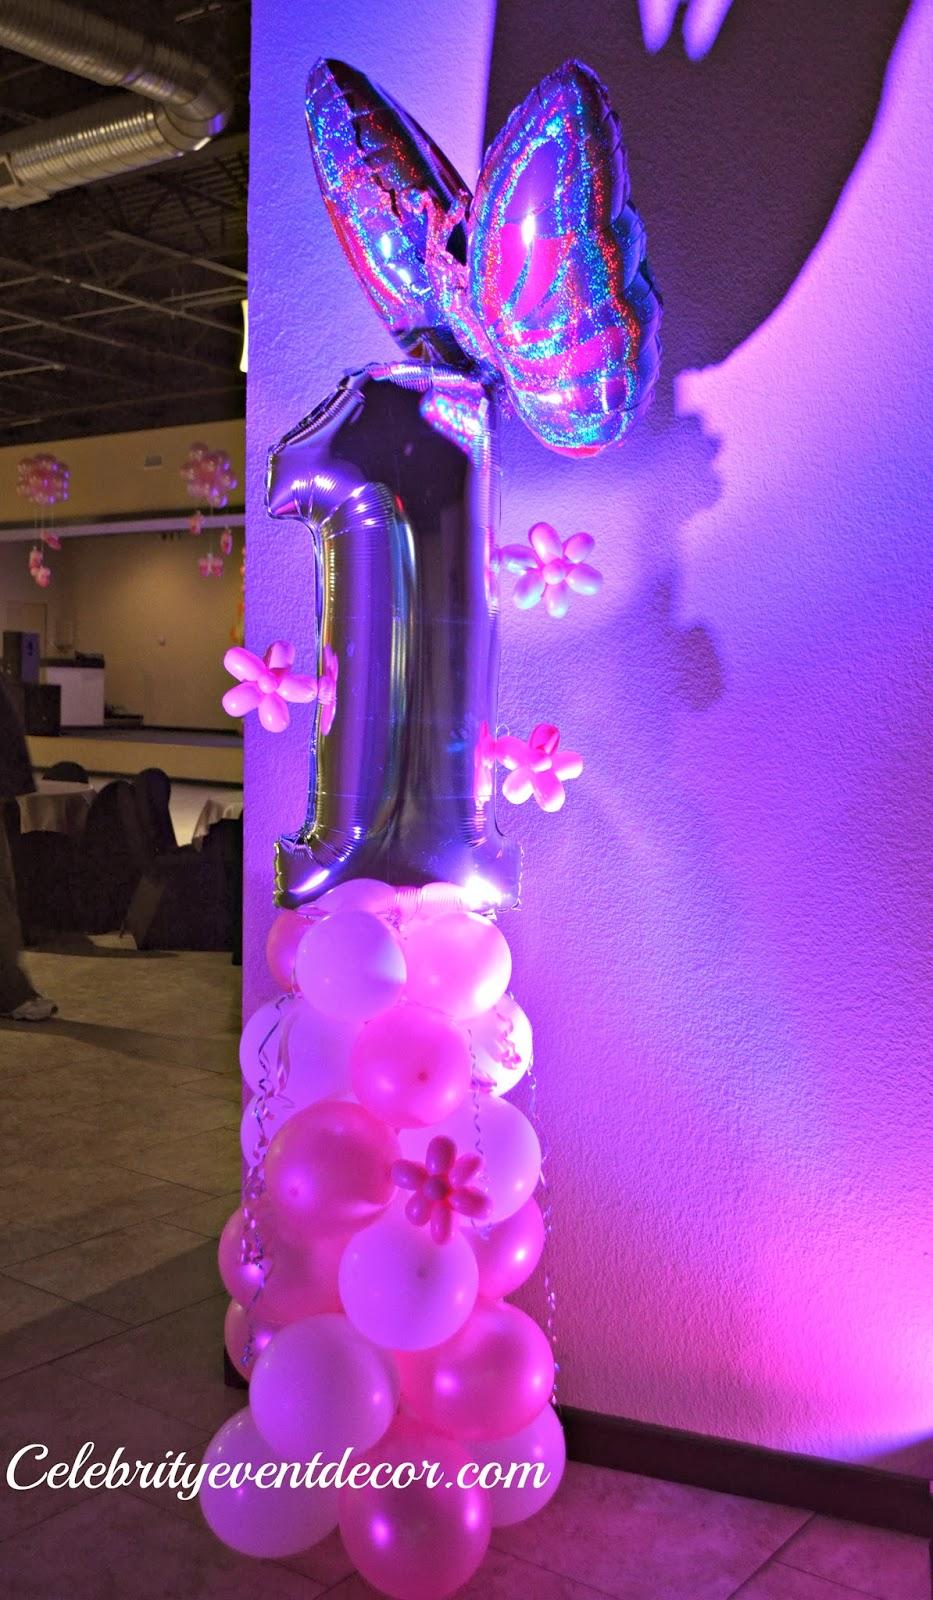 Celebrity event decor banquet hall llc for 1st birthday balloon decoration ideas